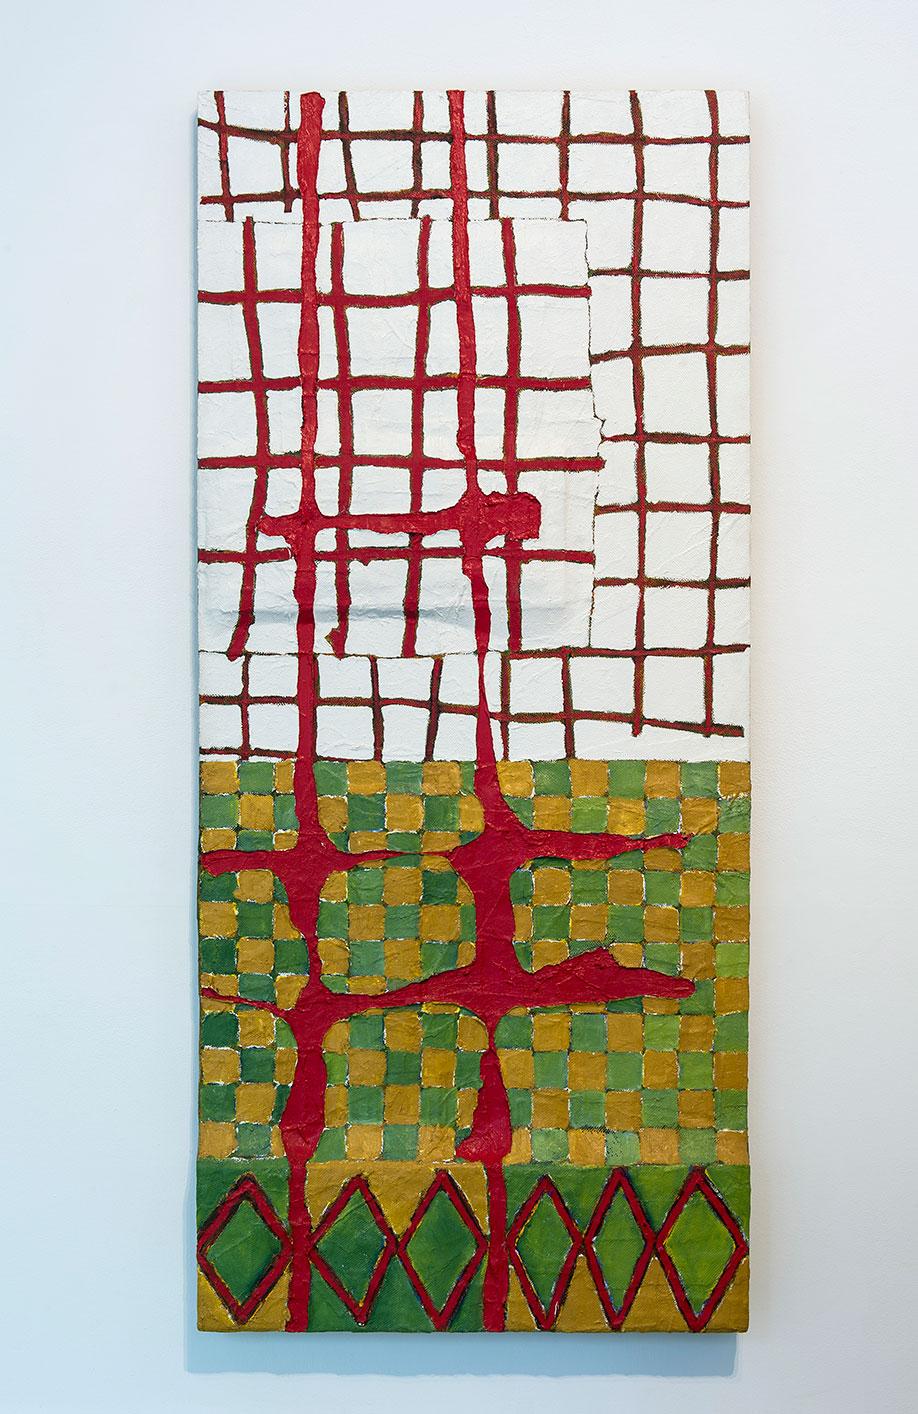 <b>Title:</b>Aughnacloy<br /><b>Year:</b>1989<br /><b>Medium:</b>Oil and mixed media on canvas on board<br /><b>Size:</b>174.5 x 76.5 x 7.5 cm